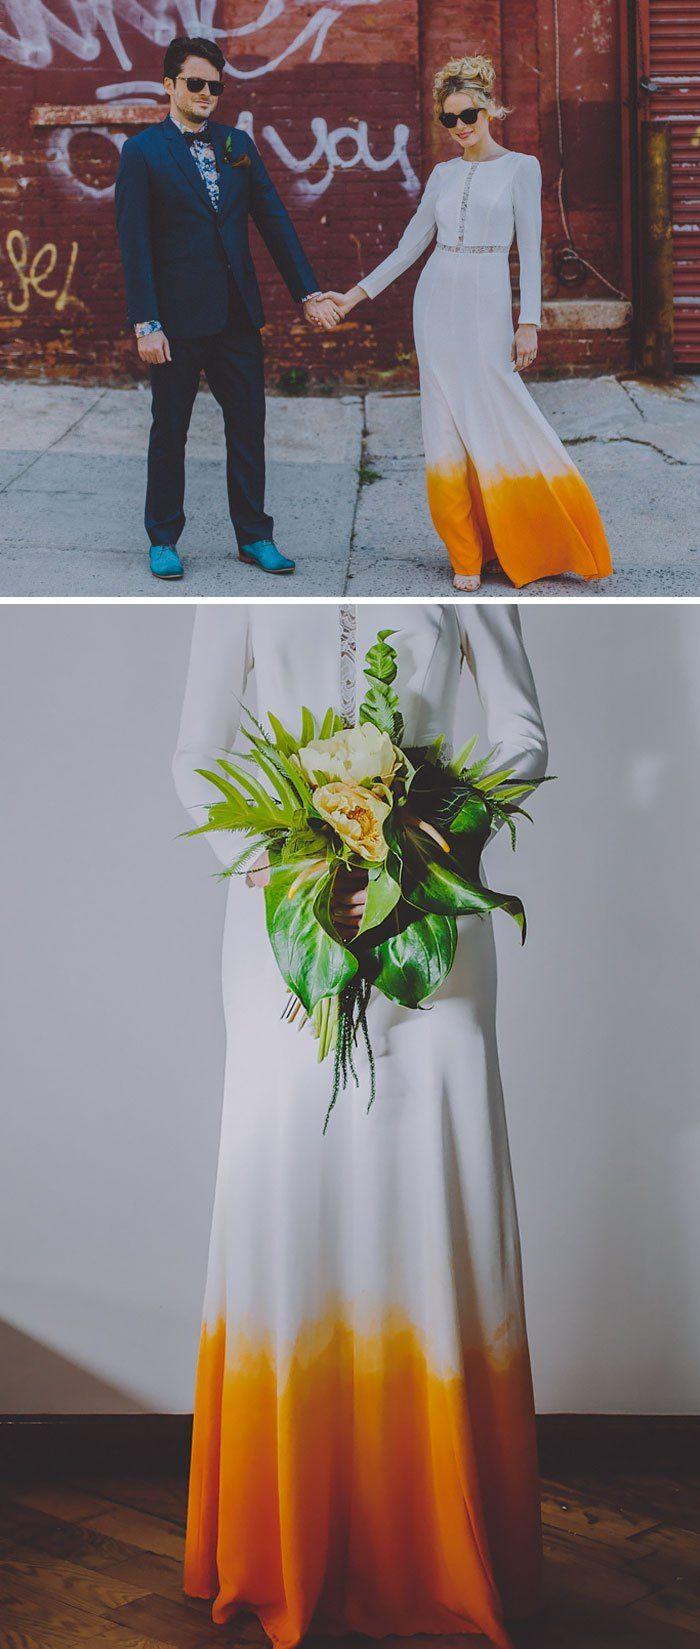 Dye wedding dress after wedding  Pin by Habiba Doorenbos on Love the dress  Pinterest  Dip dyed